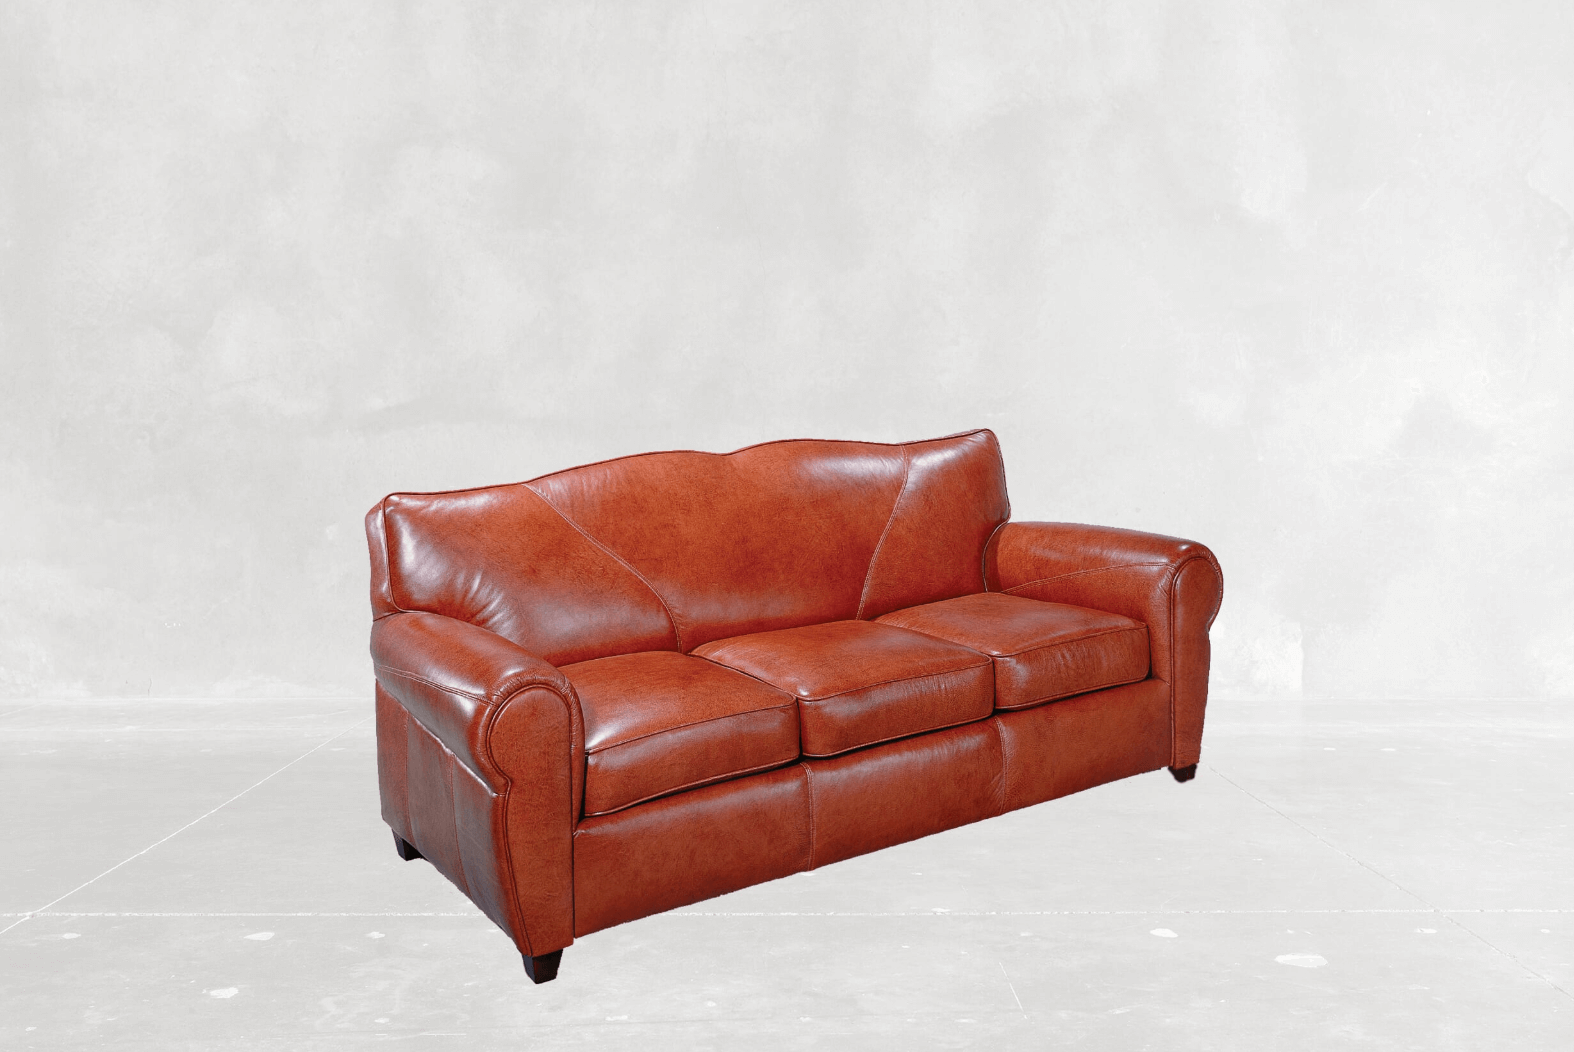 Paris Club Sofa - Creative Leather